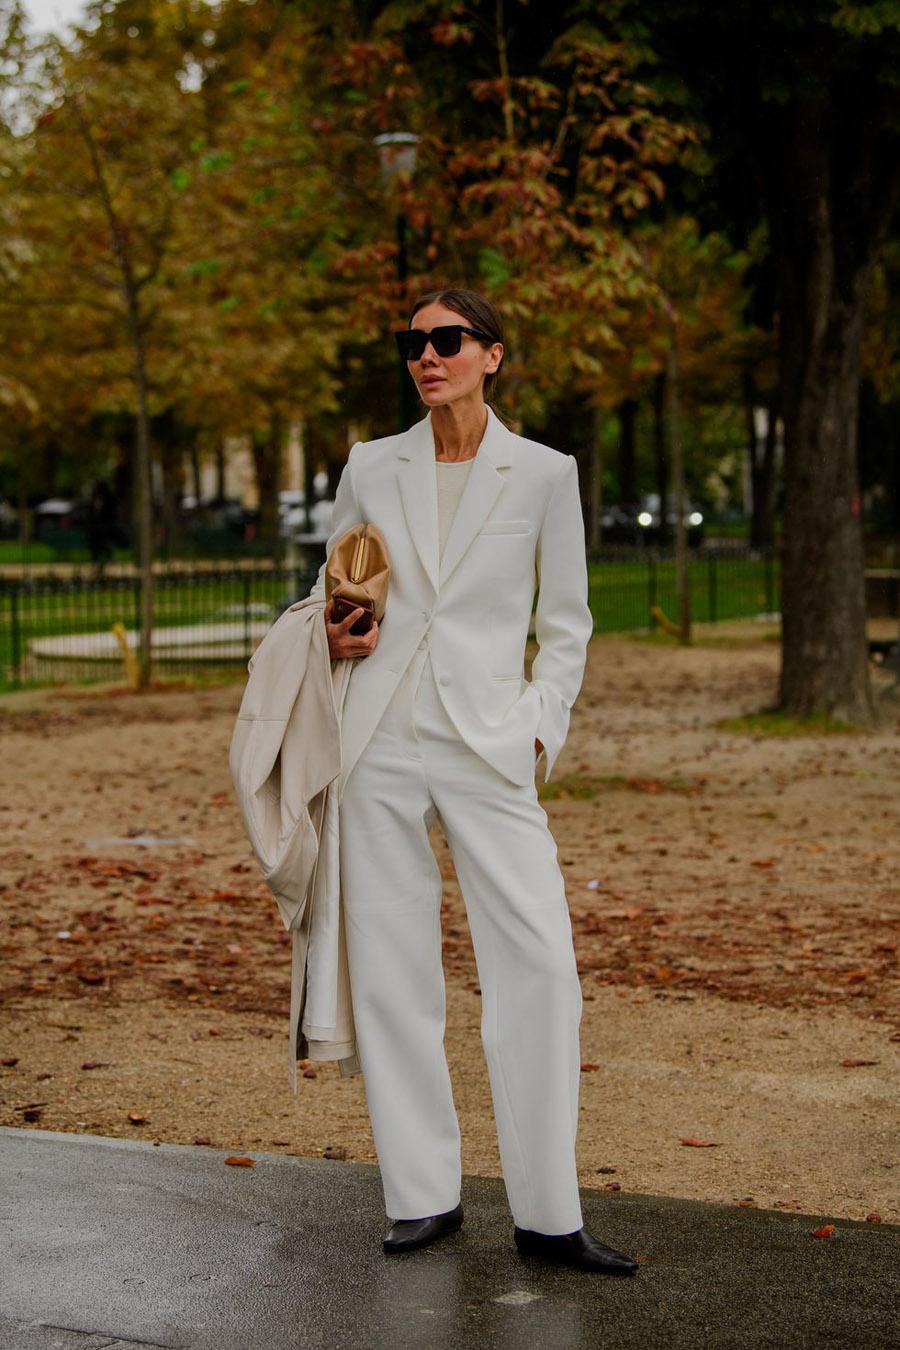 paris-fashion-week-pfw-street-style-ss20-day-7-by-tyler-joe-109-1570134336